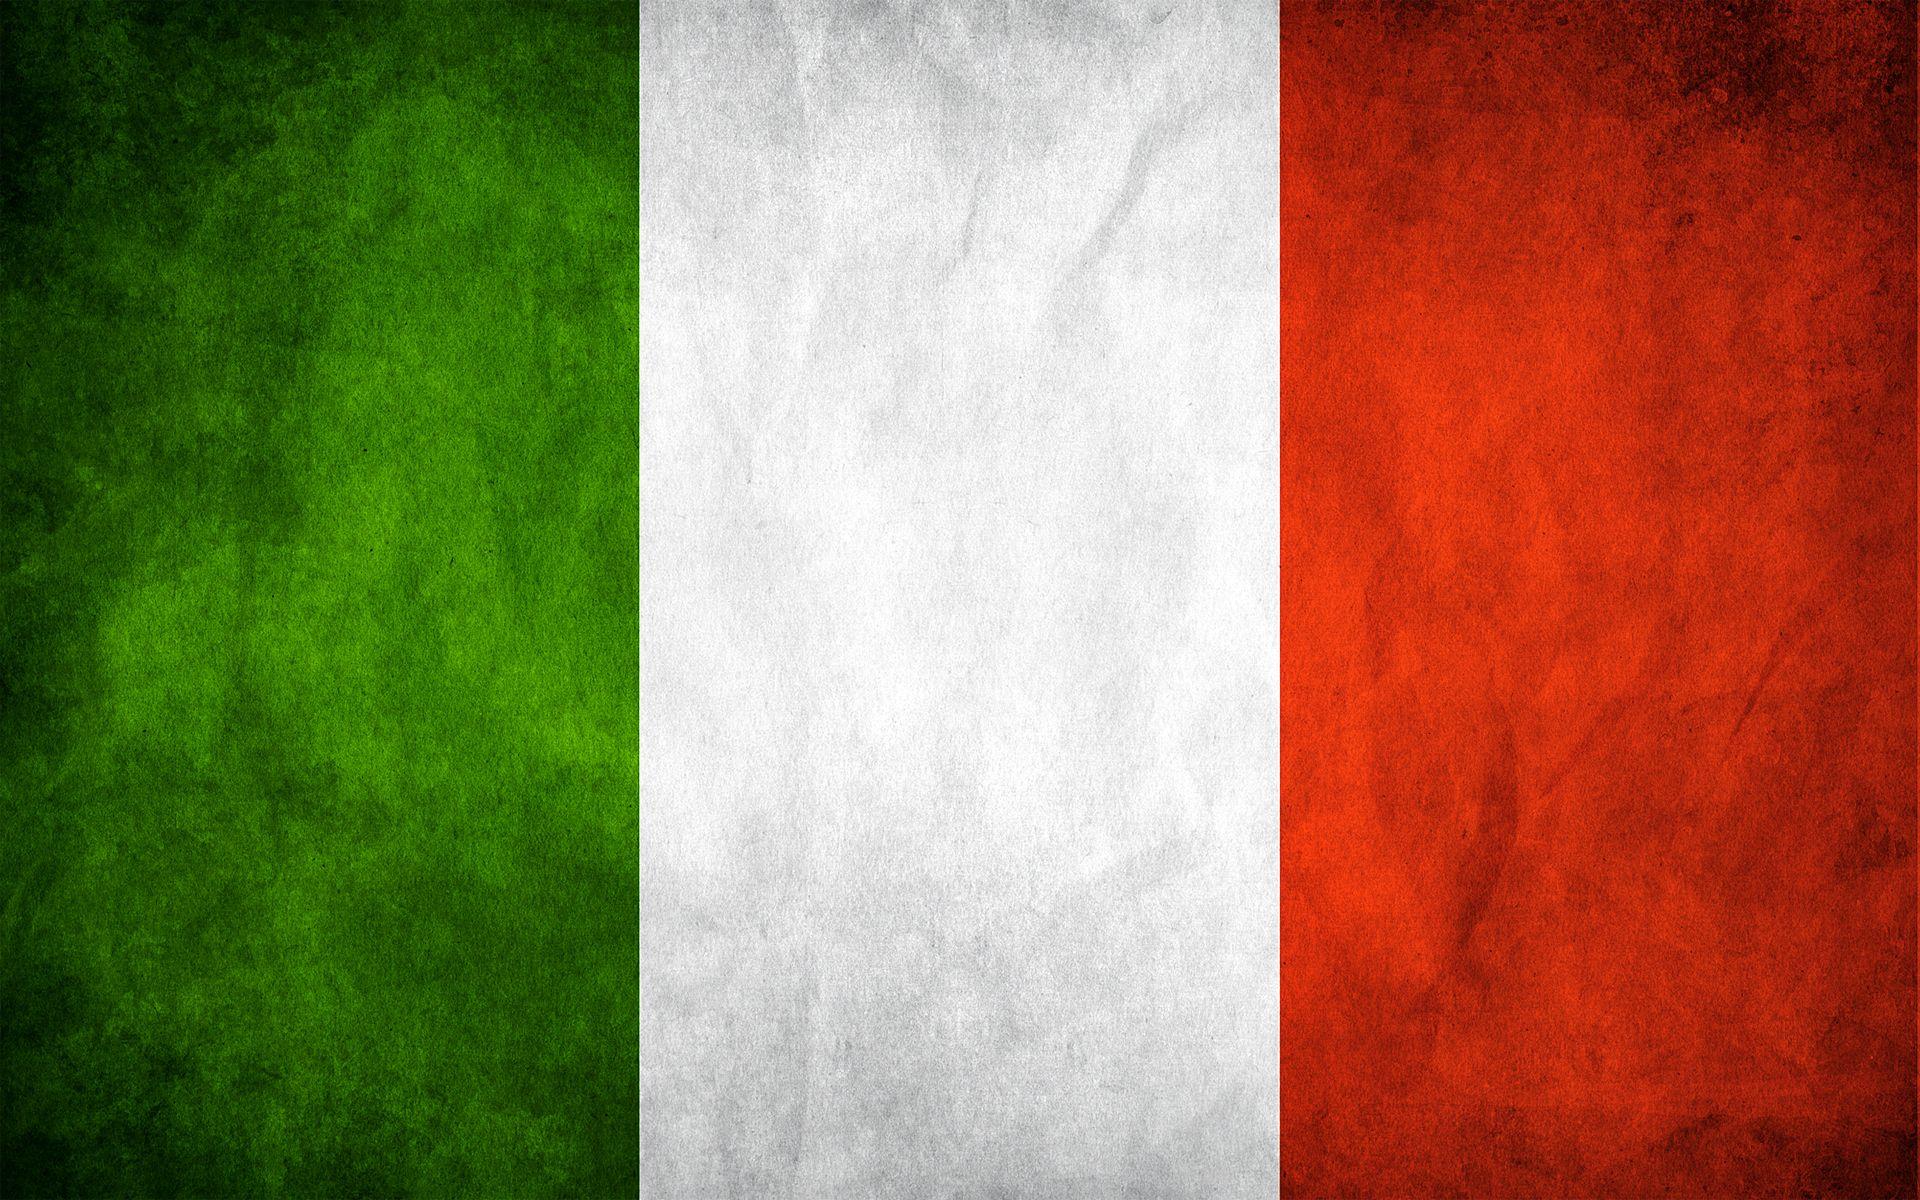 Gambar Digambar Tangan Kartun Bendera Italia Italia Bendera Italia Tiang Bendera Png Dan Vektor Dengan Latar Belakang Transparan Untuk Unduh Gratis How To Draw Hands Italian Flag Flag Vector